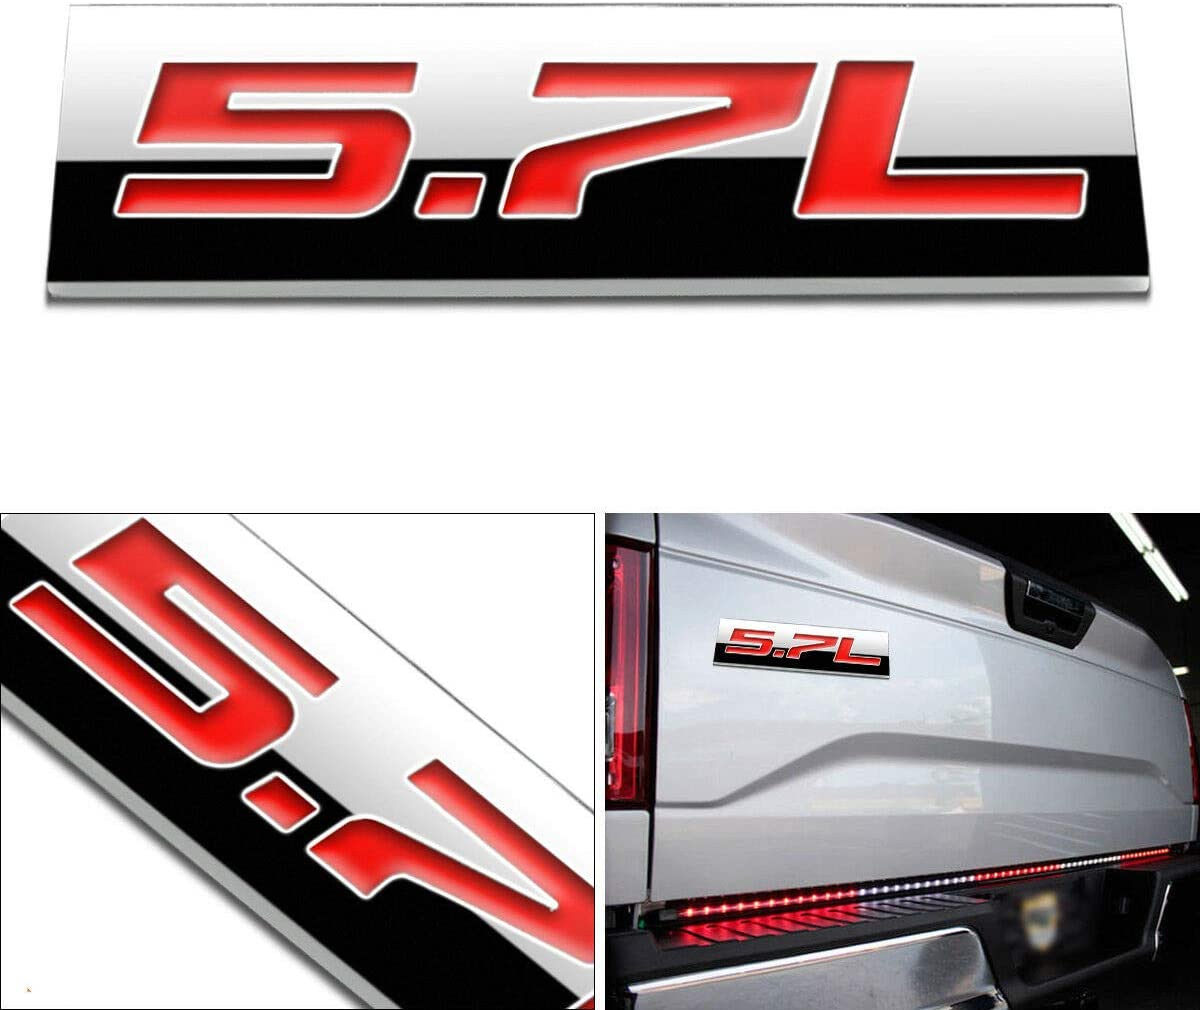 Red 1x 3D Chrome Finish Metal 5.7L Emblem Alloy Badge Sticker